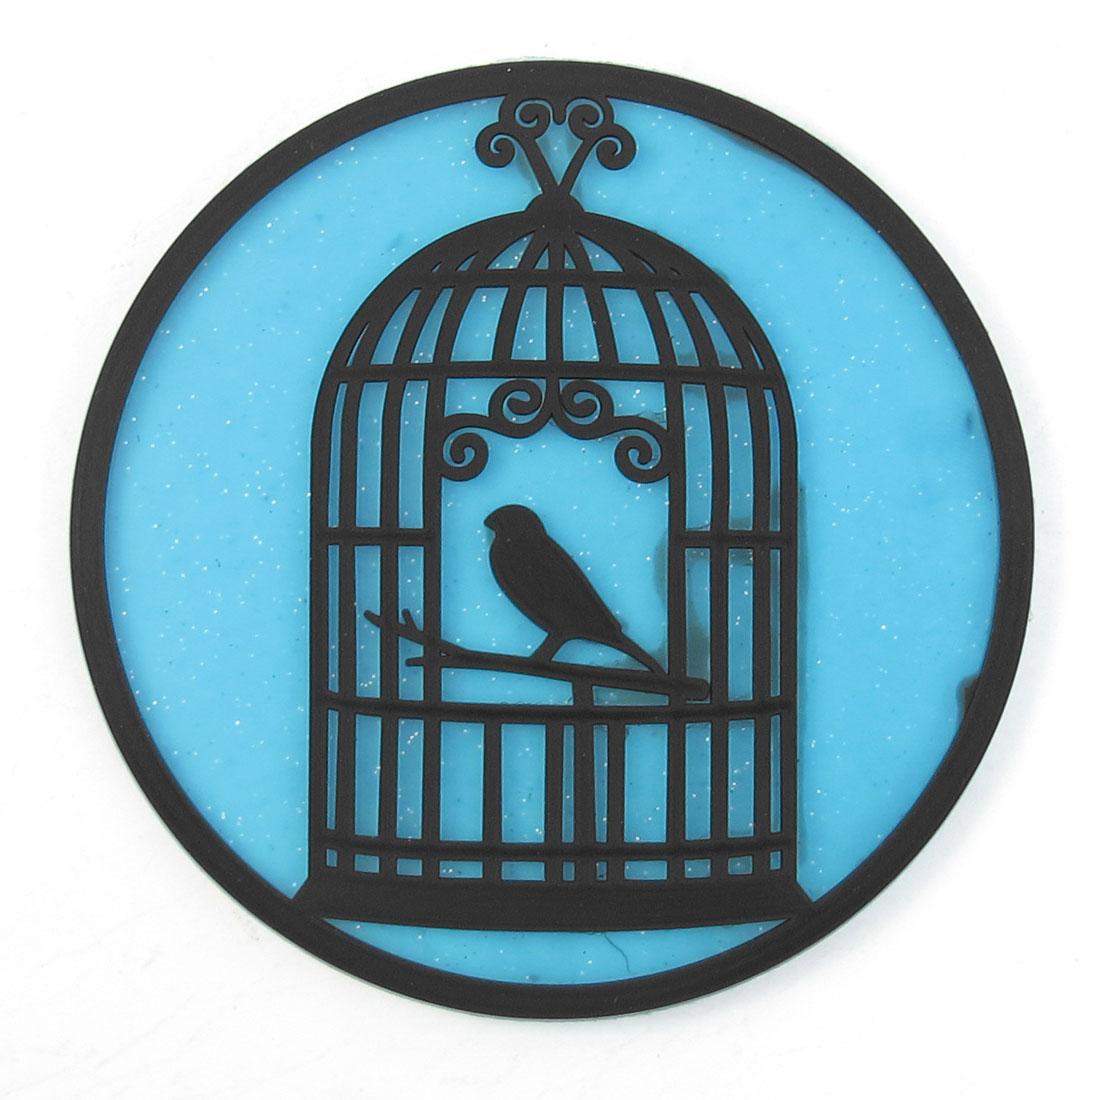 "3.5"" Diameter Black Clear Blue Soft Plastic Heat Insulation Coaster"